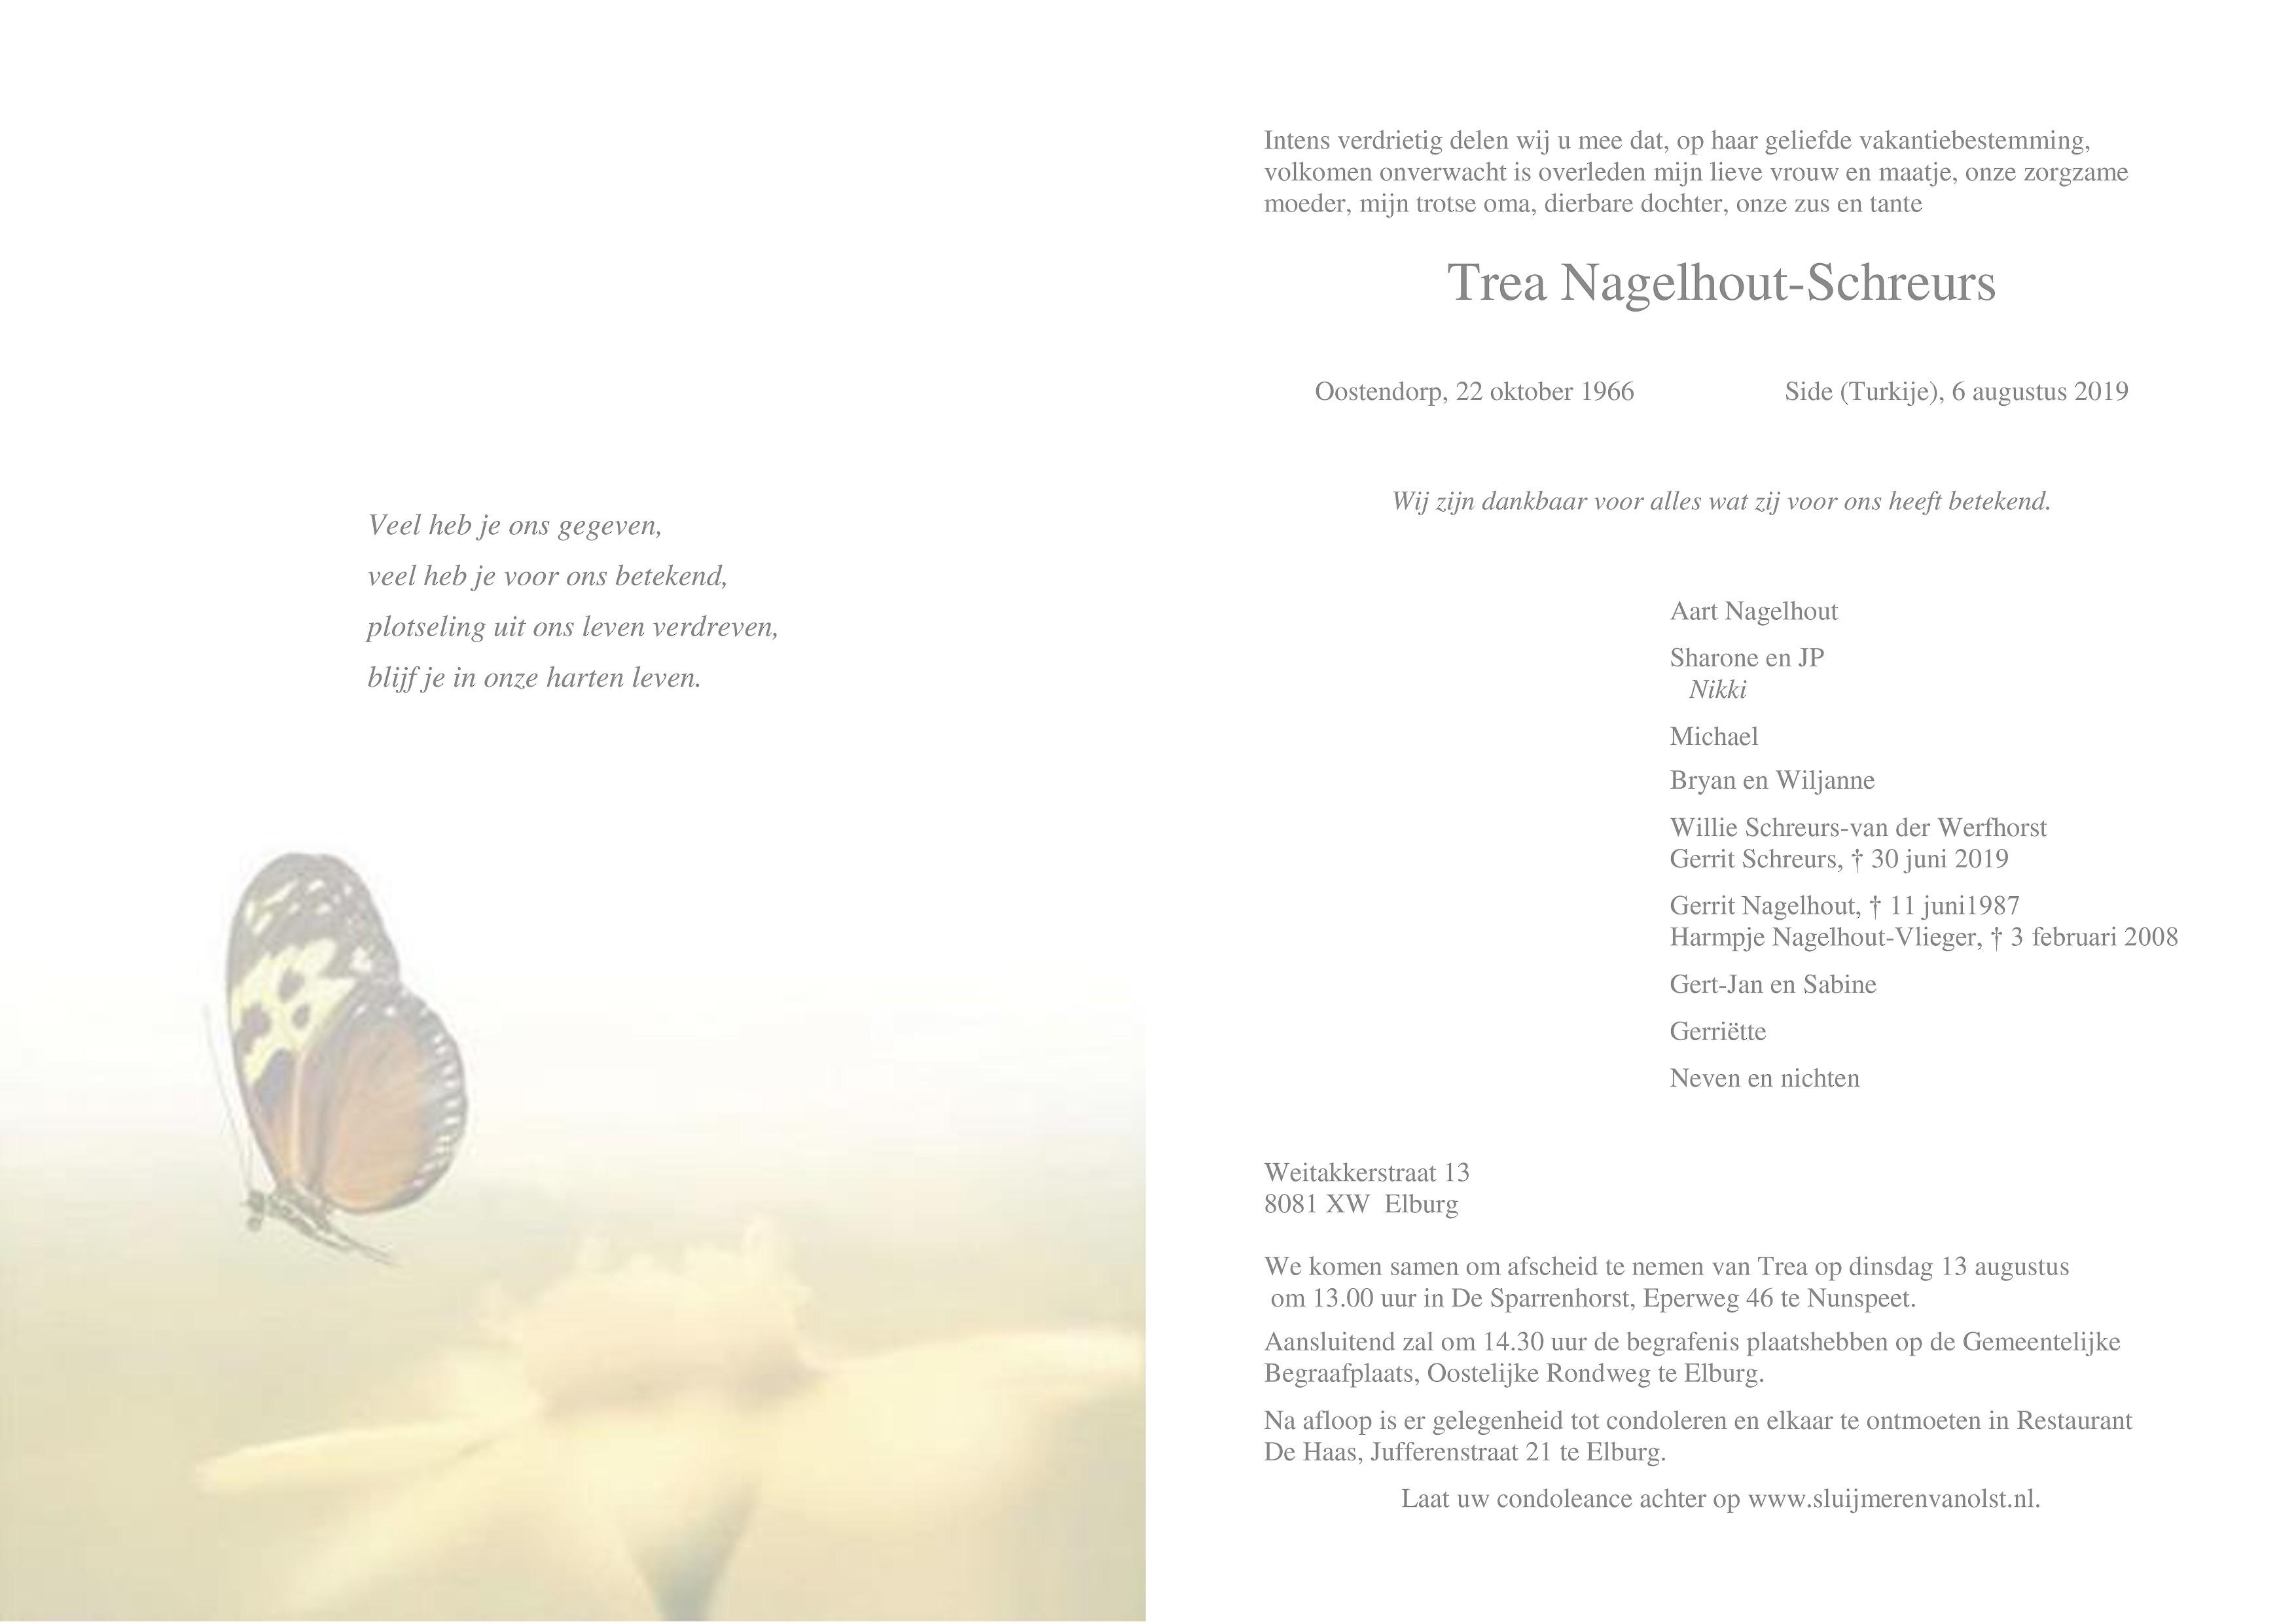 Trea Nagelhout-Schreurs Death notice